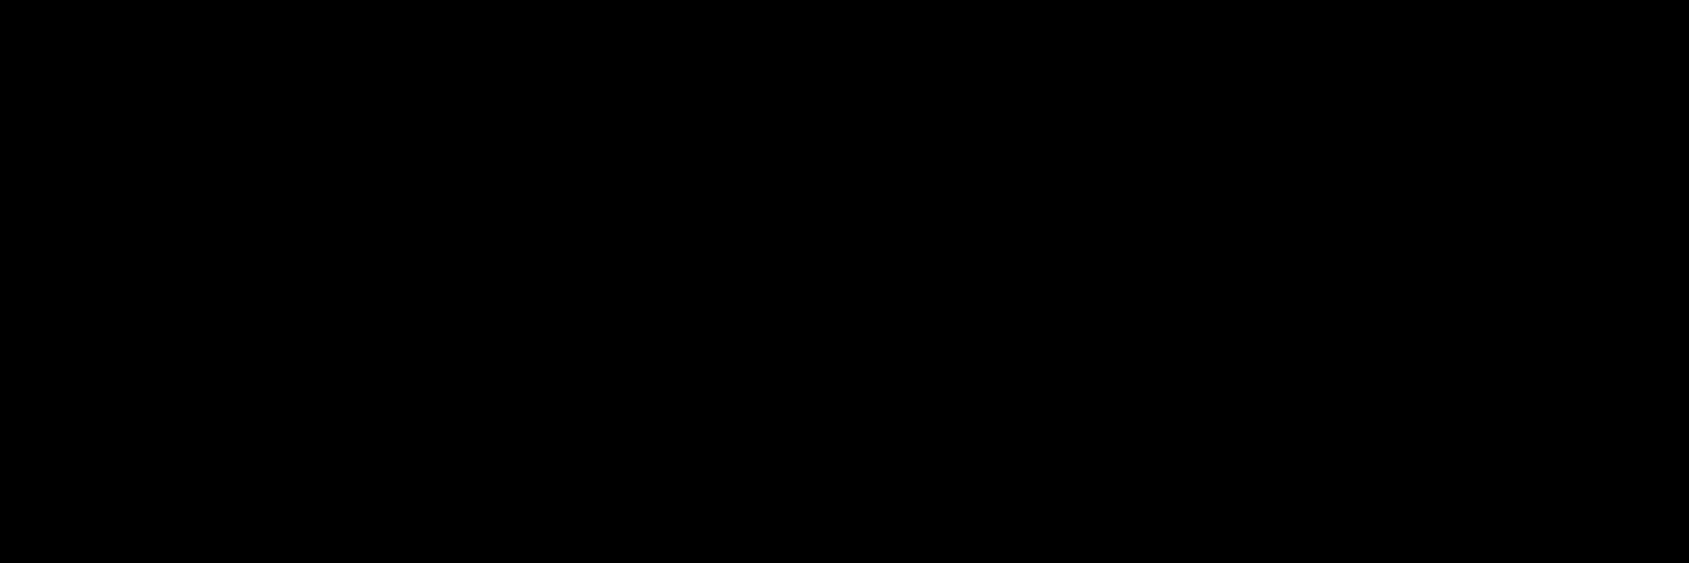 rac-Normetanephrine-β-O-glucuronide